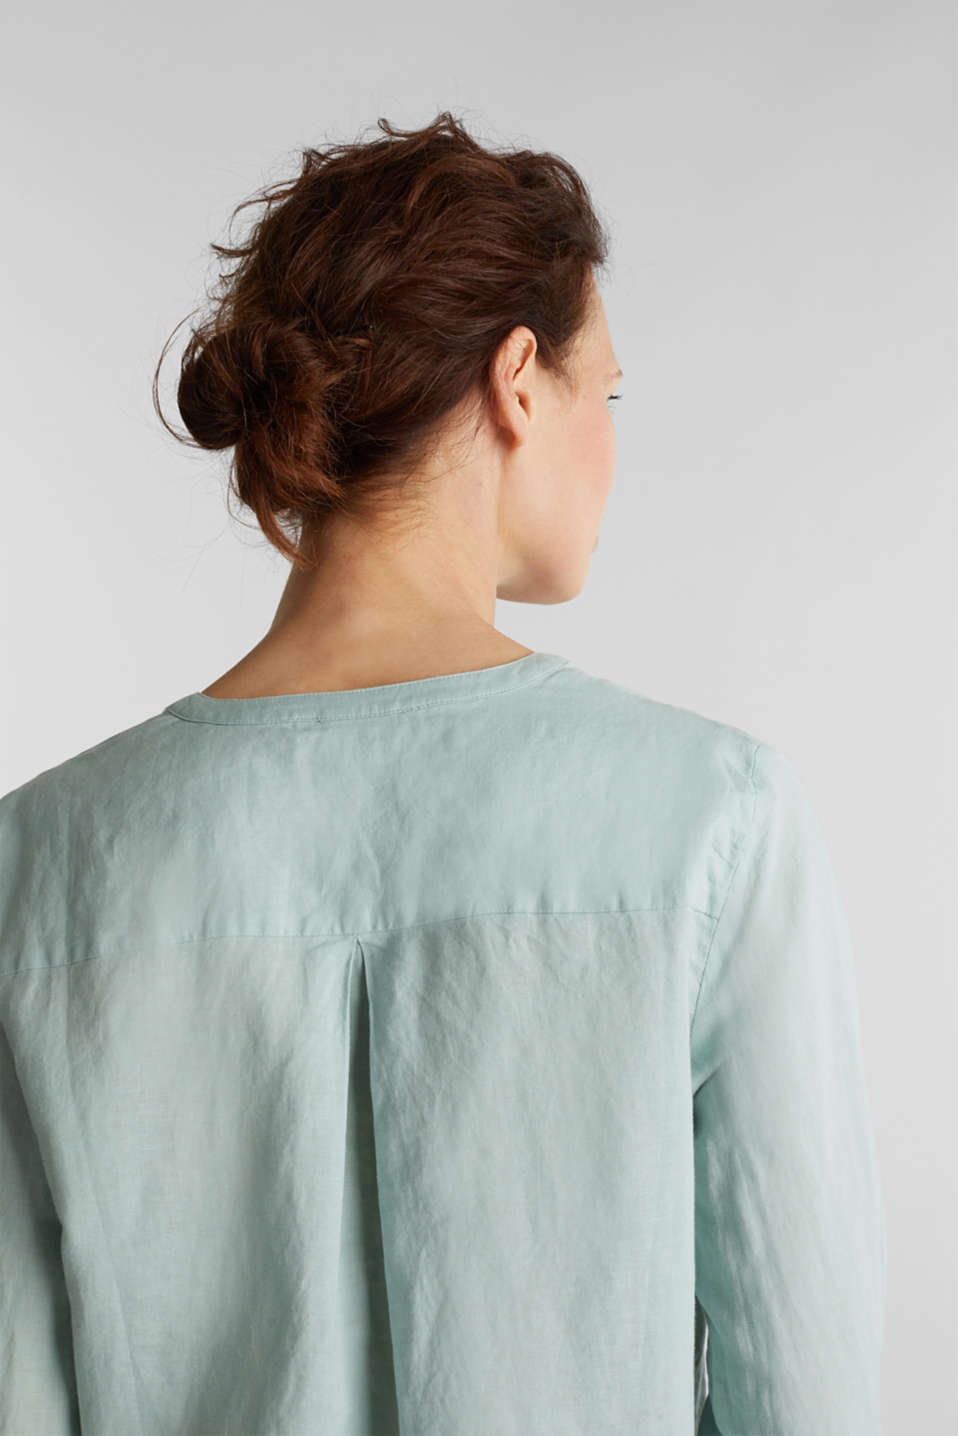 Turn-up blouse in blended linen, LIGHT AQUA GREEN, detail image number 6